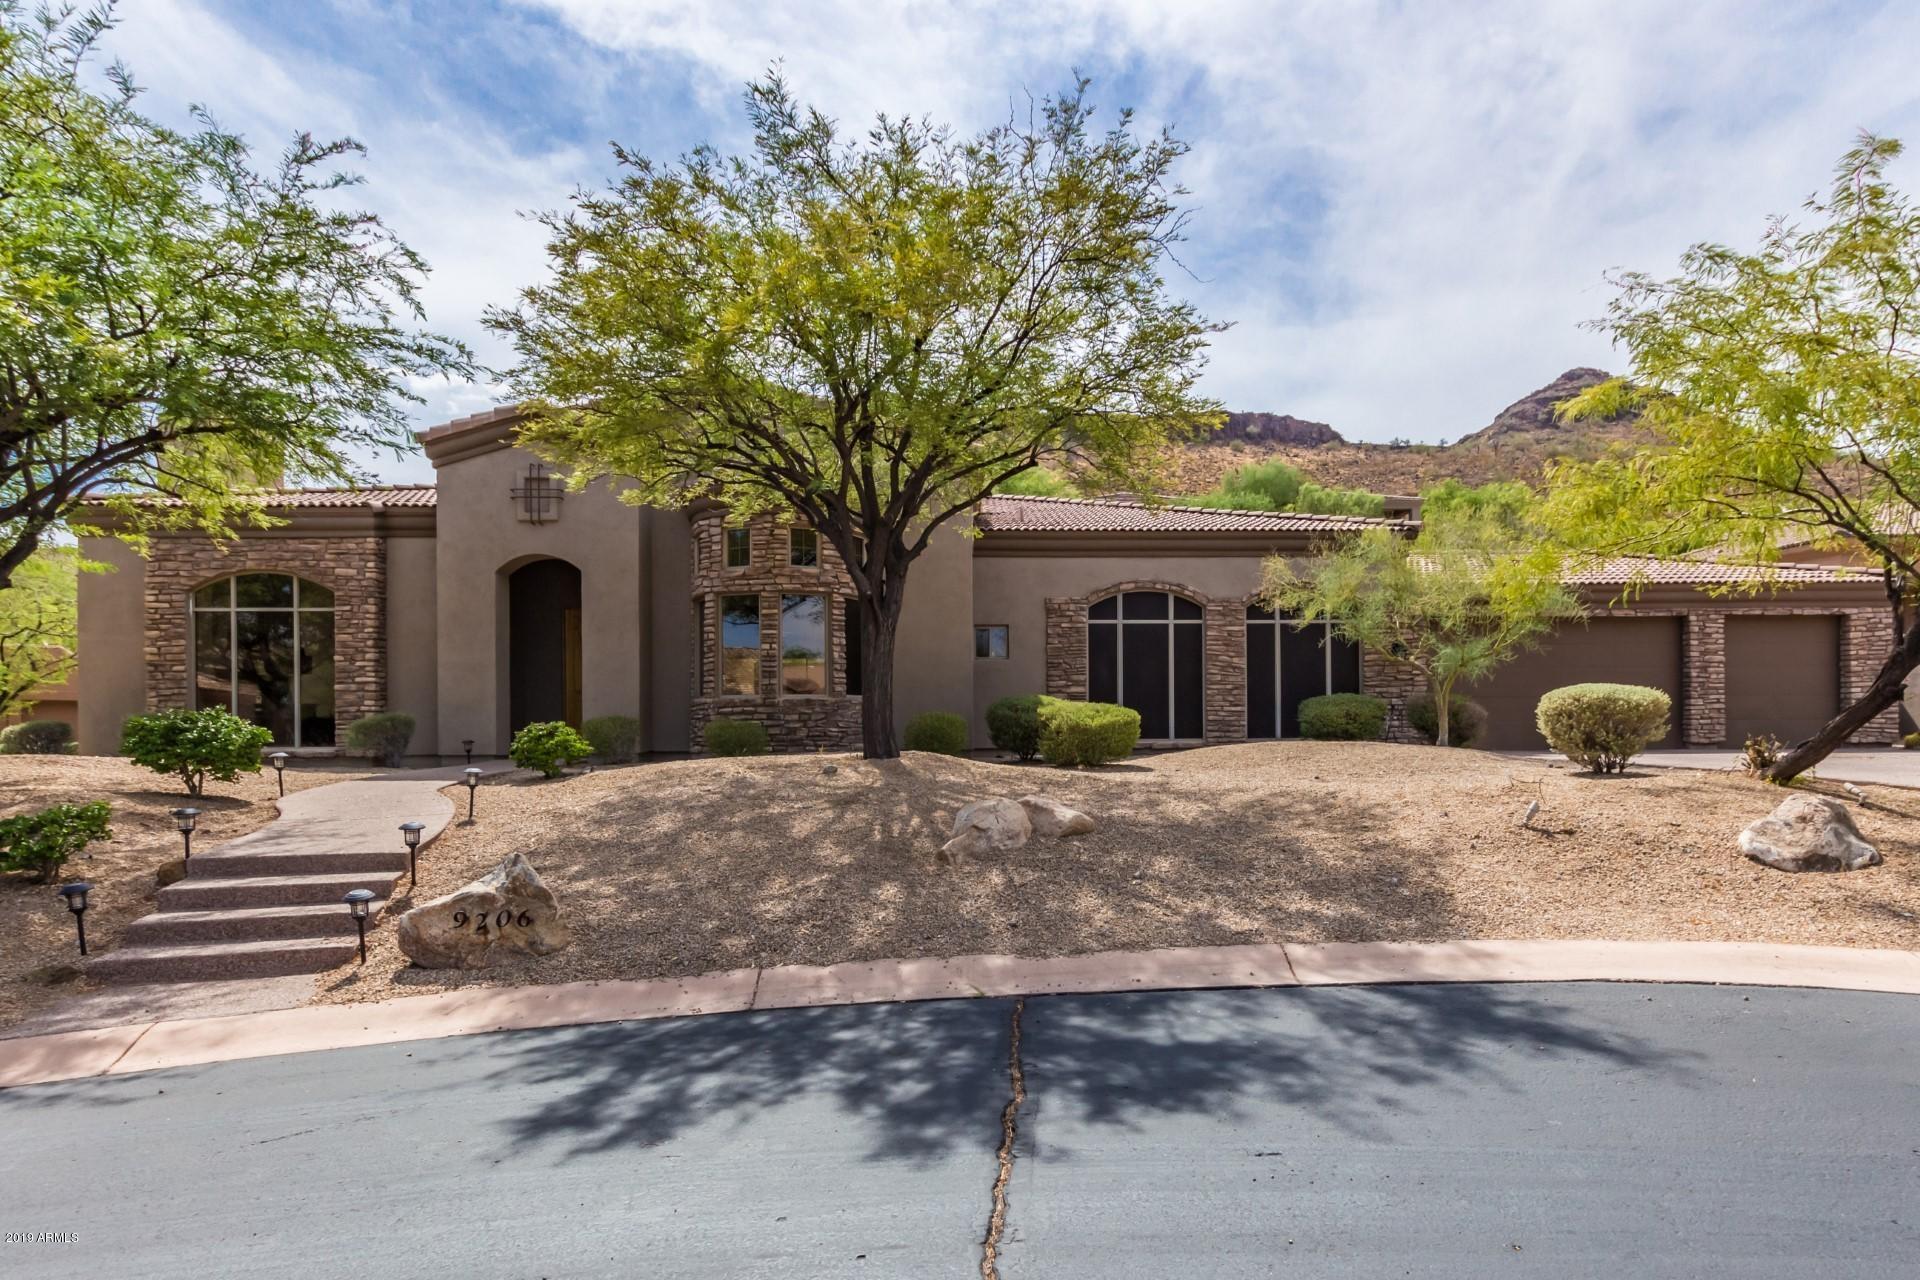 Photo of 9206 N Crimson Canyon, Fountain Hills, AZ 85268